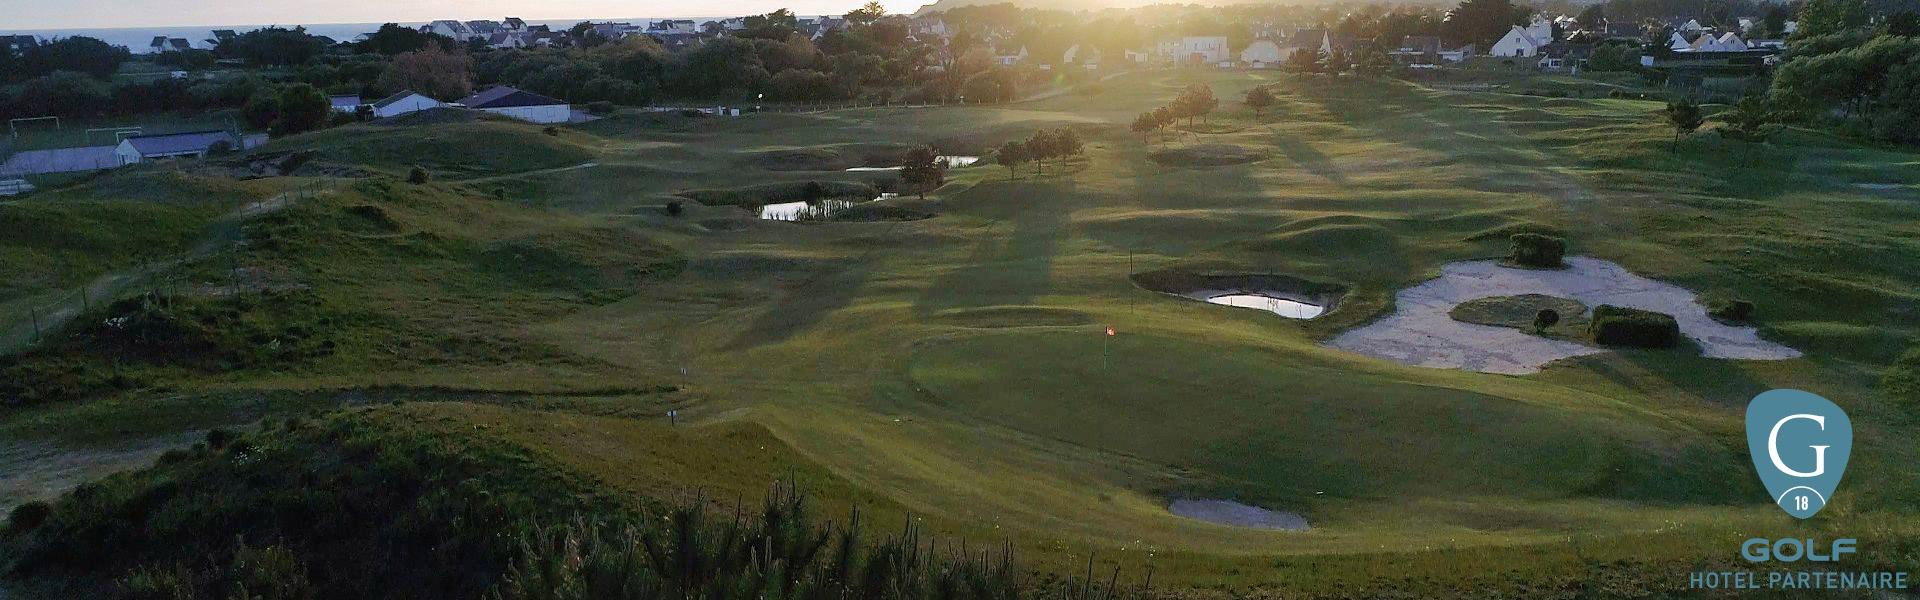 golf-cotedesisles